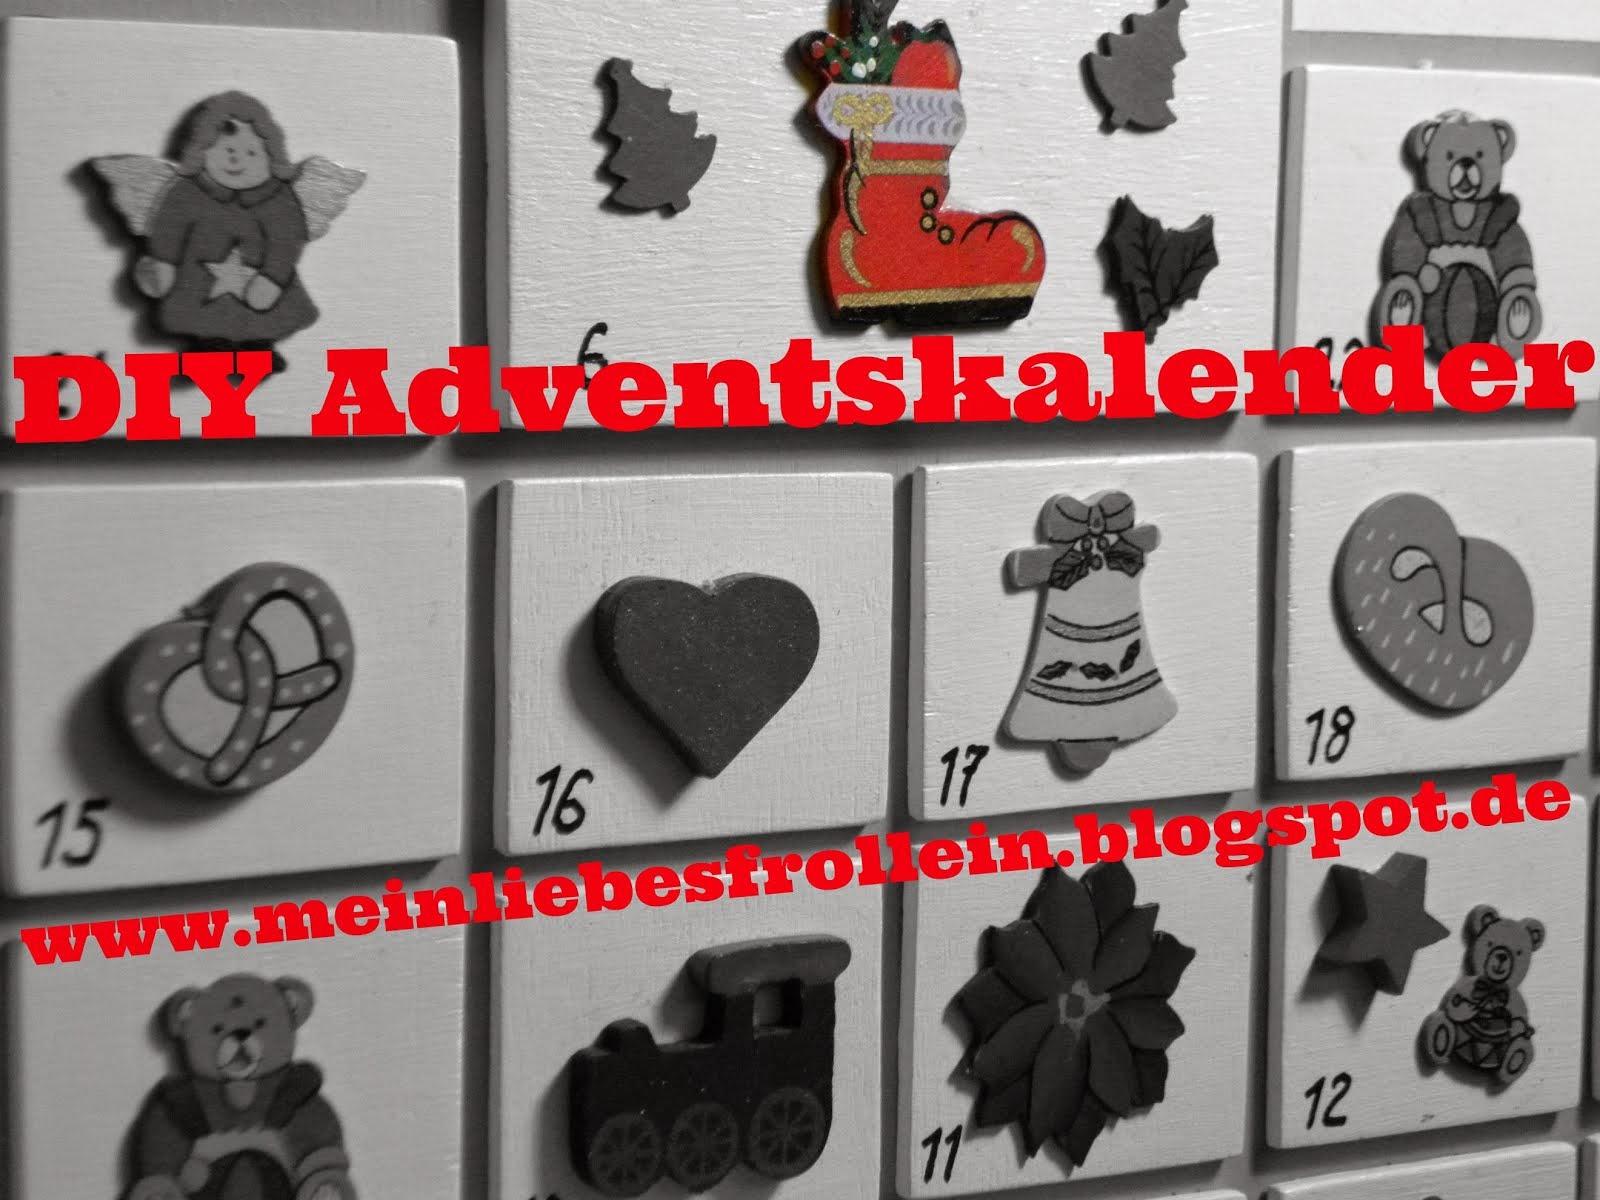 http://meinliebesfrollein.blogspot.de/2014/10/diy-adventskalender.html